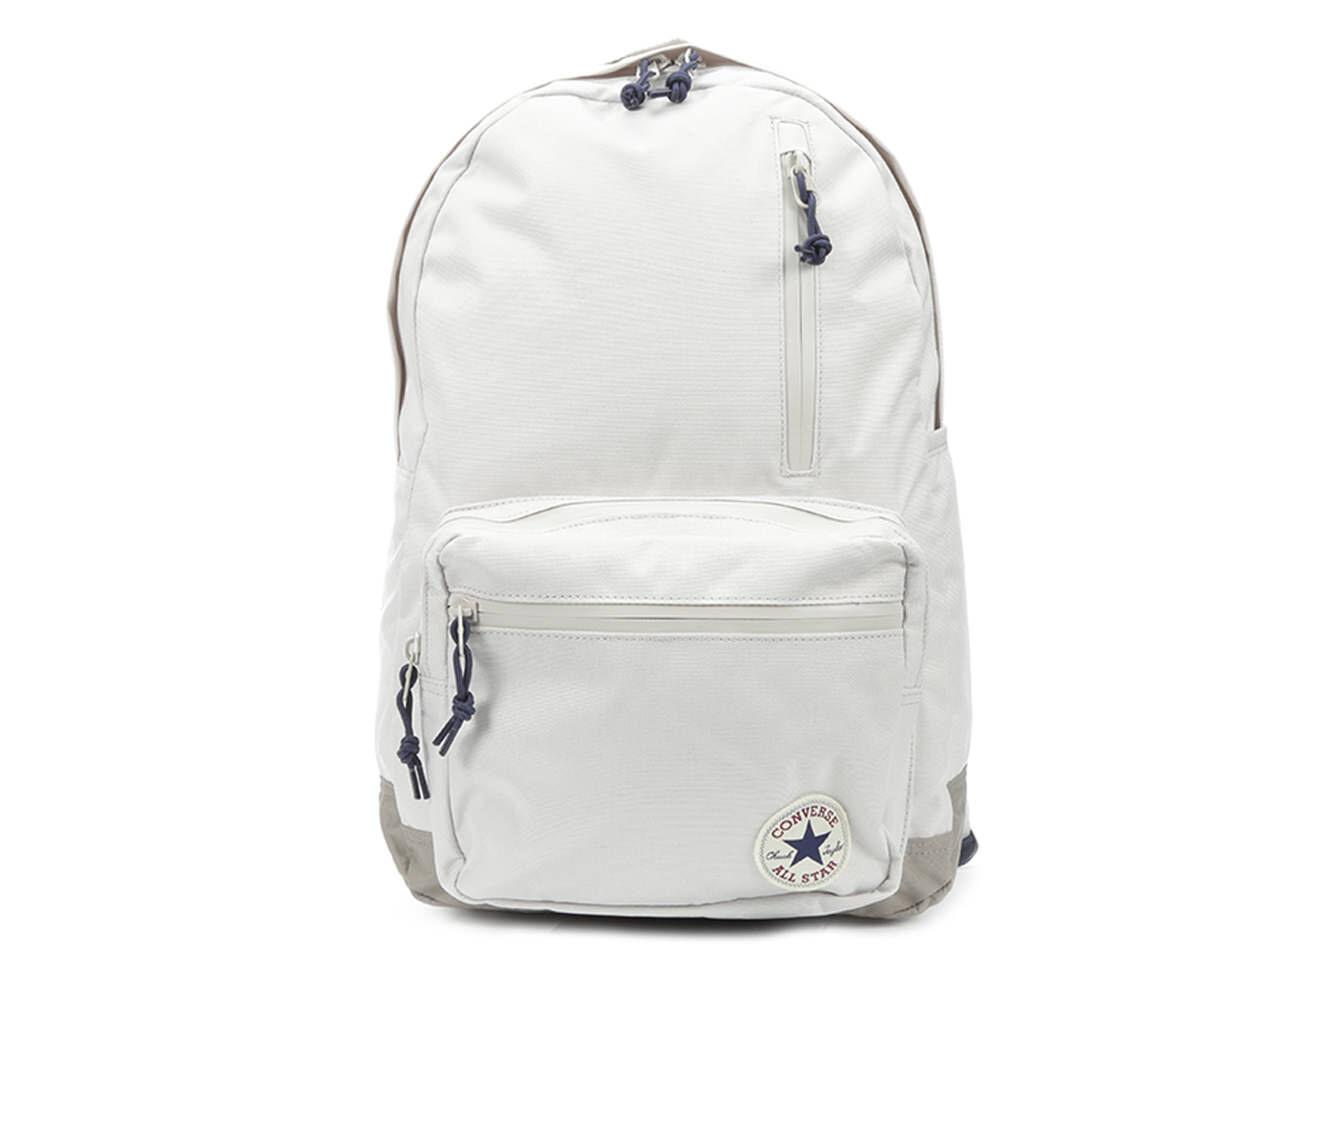 converse bookbag